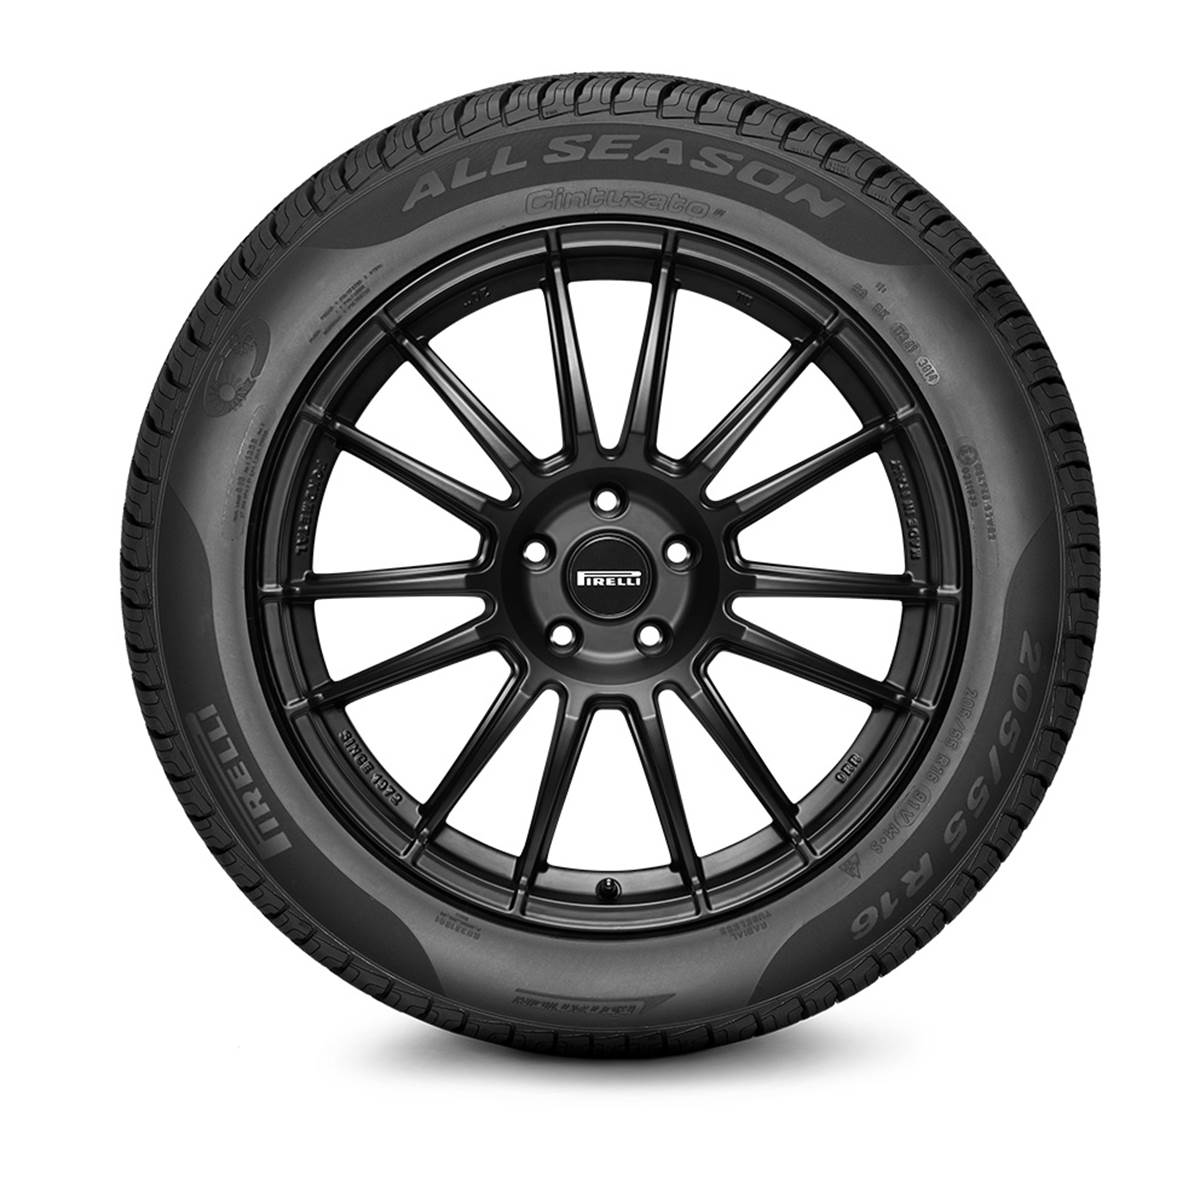 Pneu 4 Saisons Pirelli 185/65R15 88H Cinturato All Season